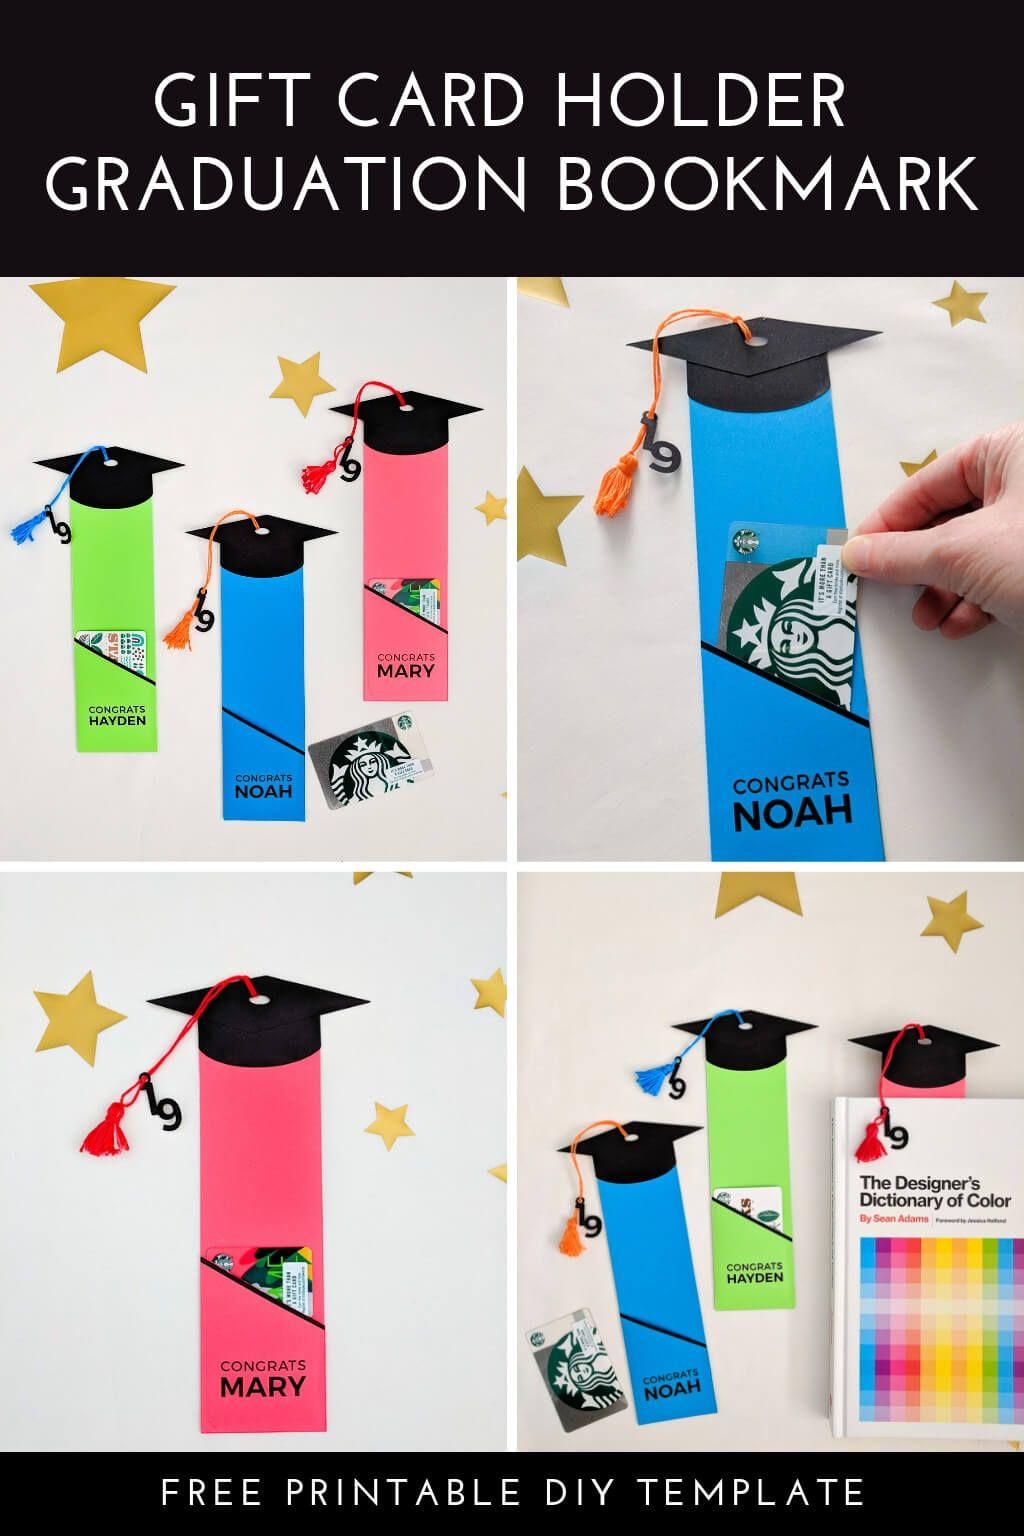 Graduation Gift Card Holder Free Printable Template Diy Graduation Gifts Gift Card Holder Graduation Diy